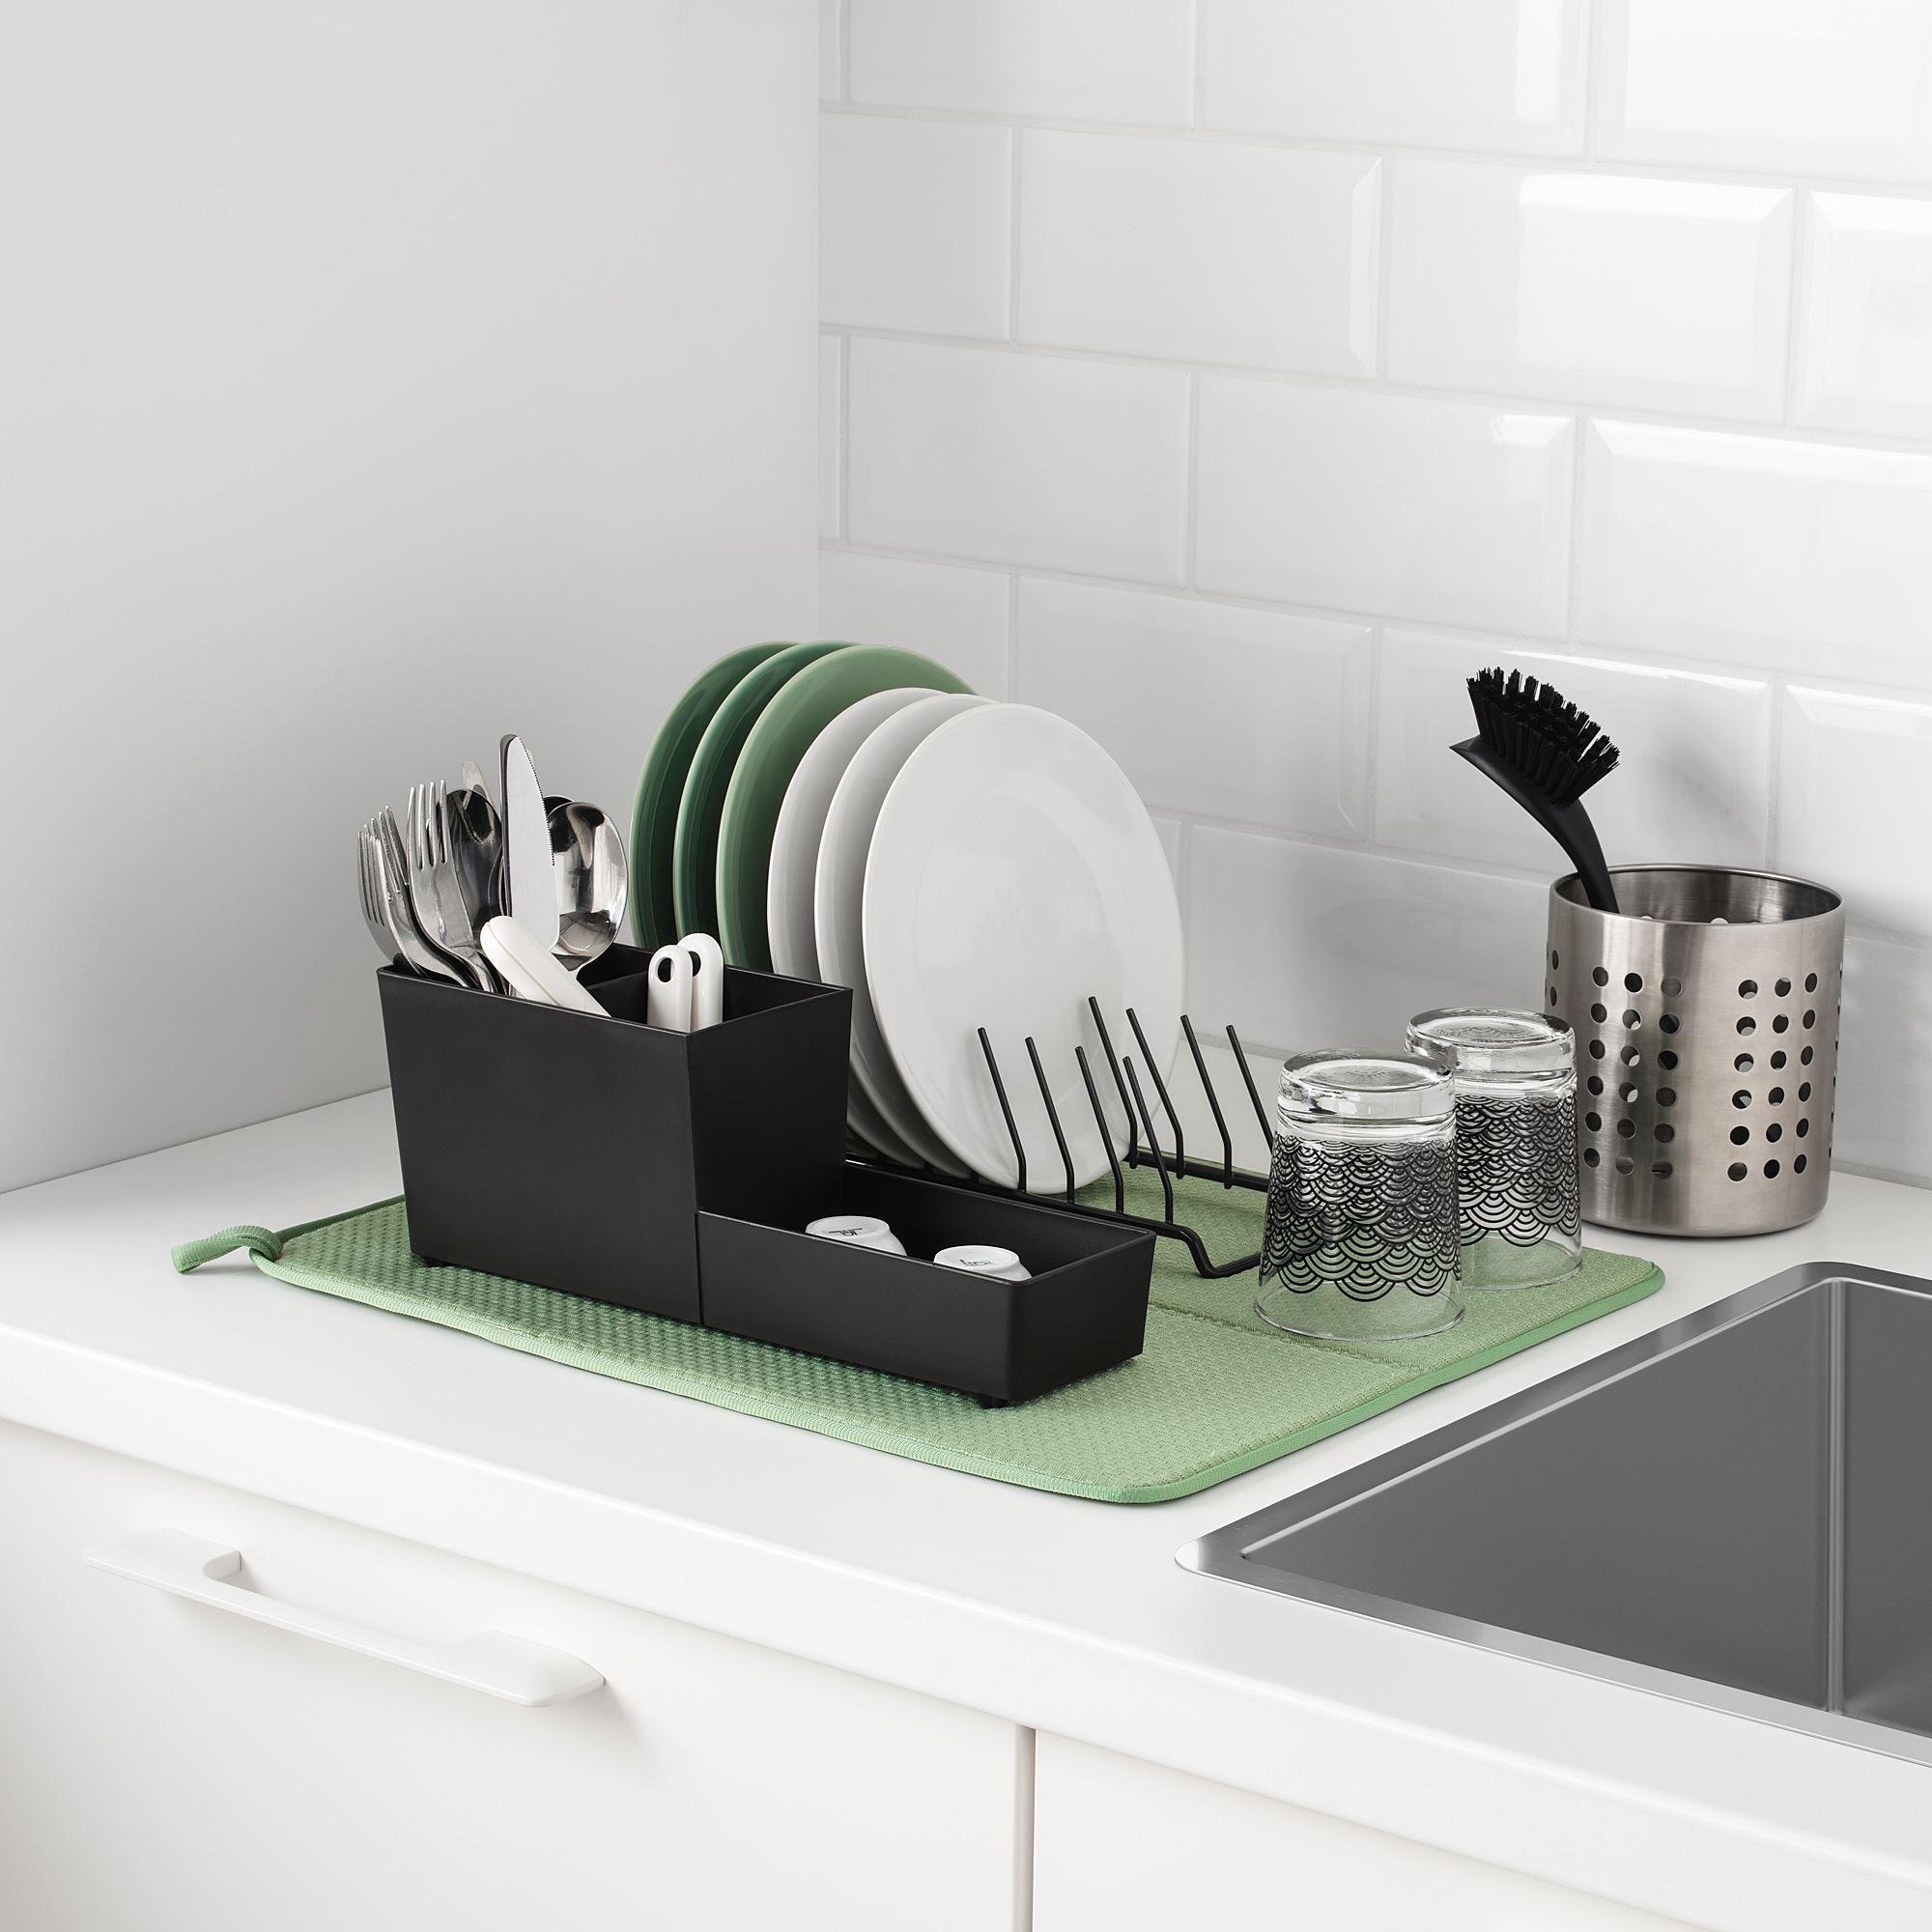 Nysk 214 Ljd Dish Drying Mat Green 44x36 Cm Ikea Cooking